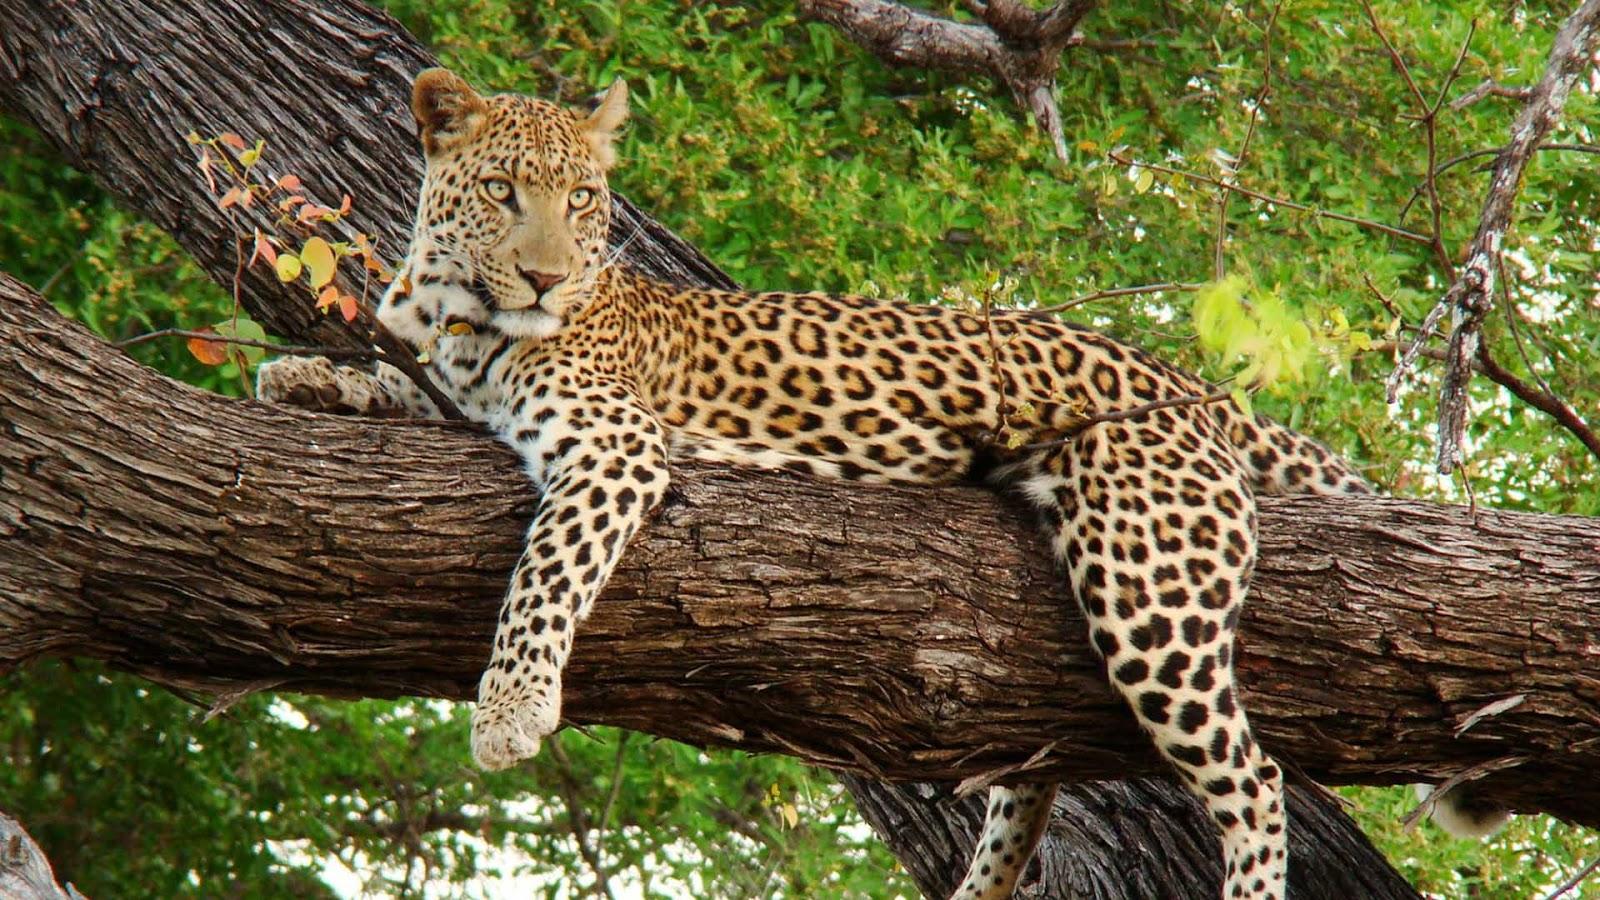 animal print wallpaper hd 1080p - photo #5